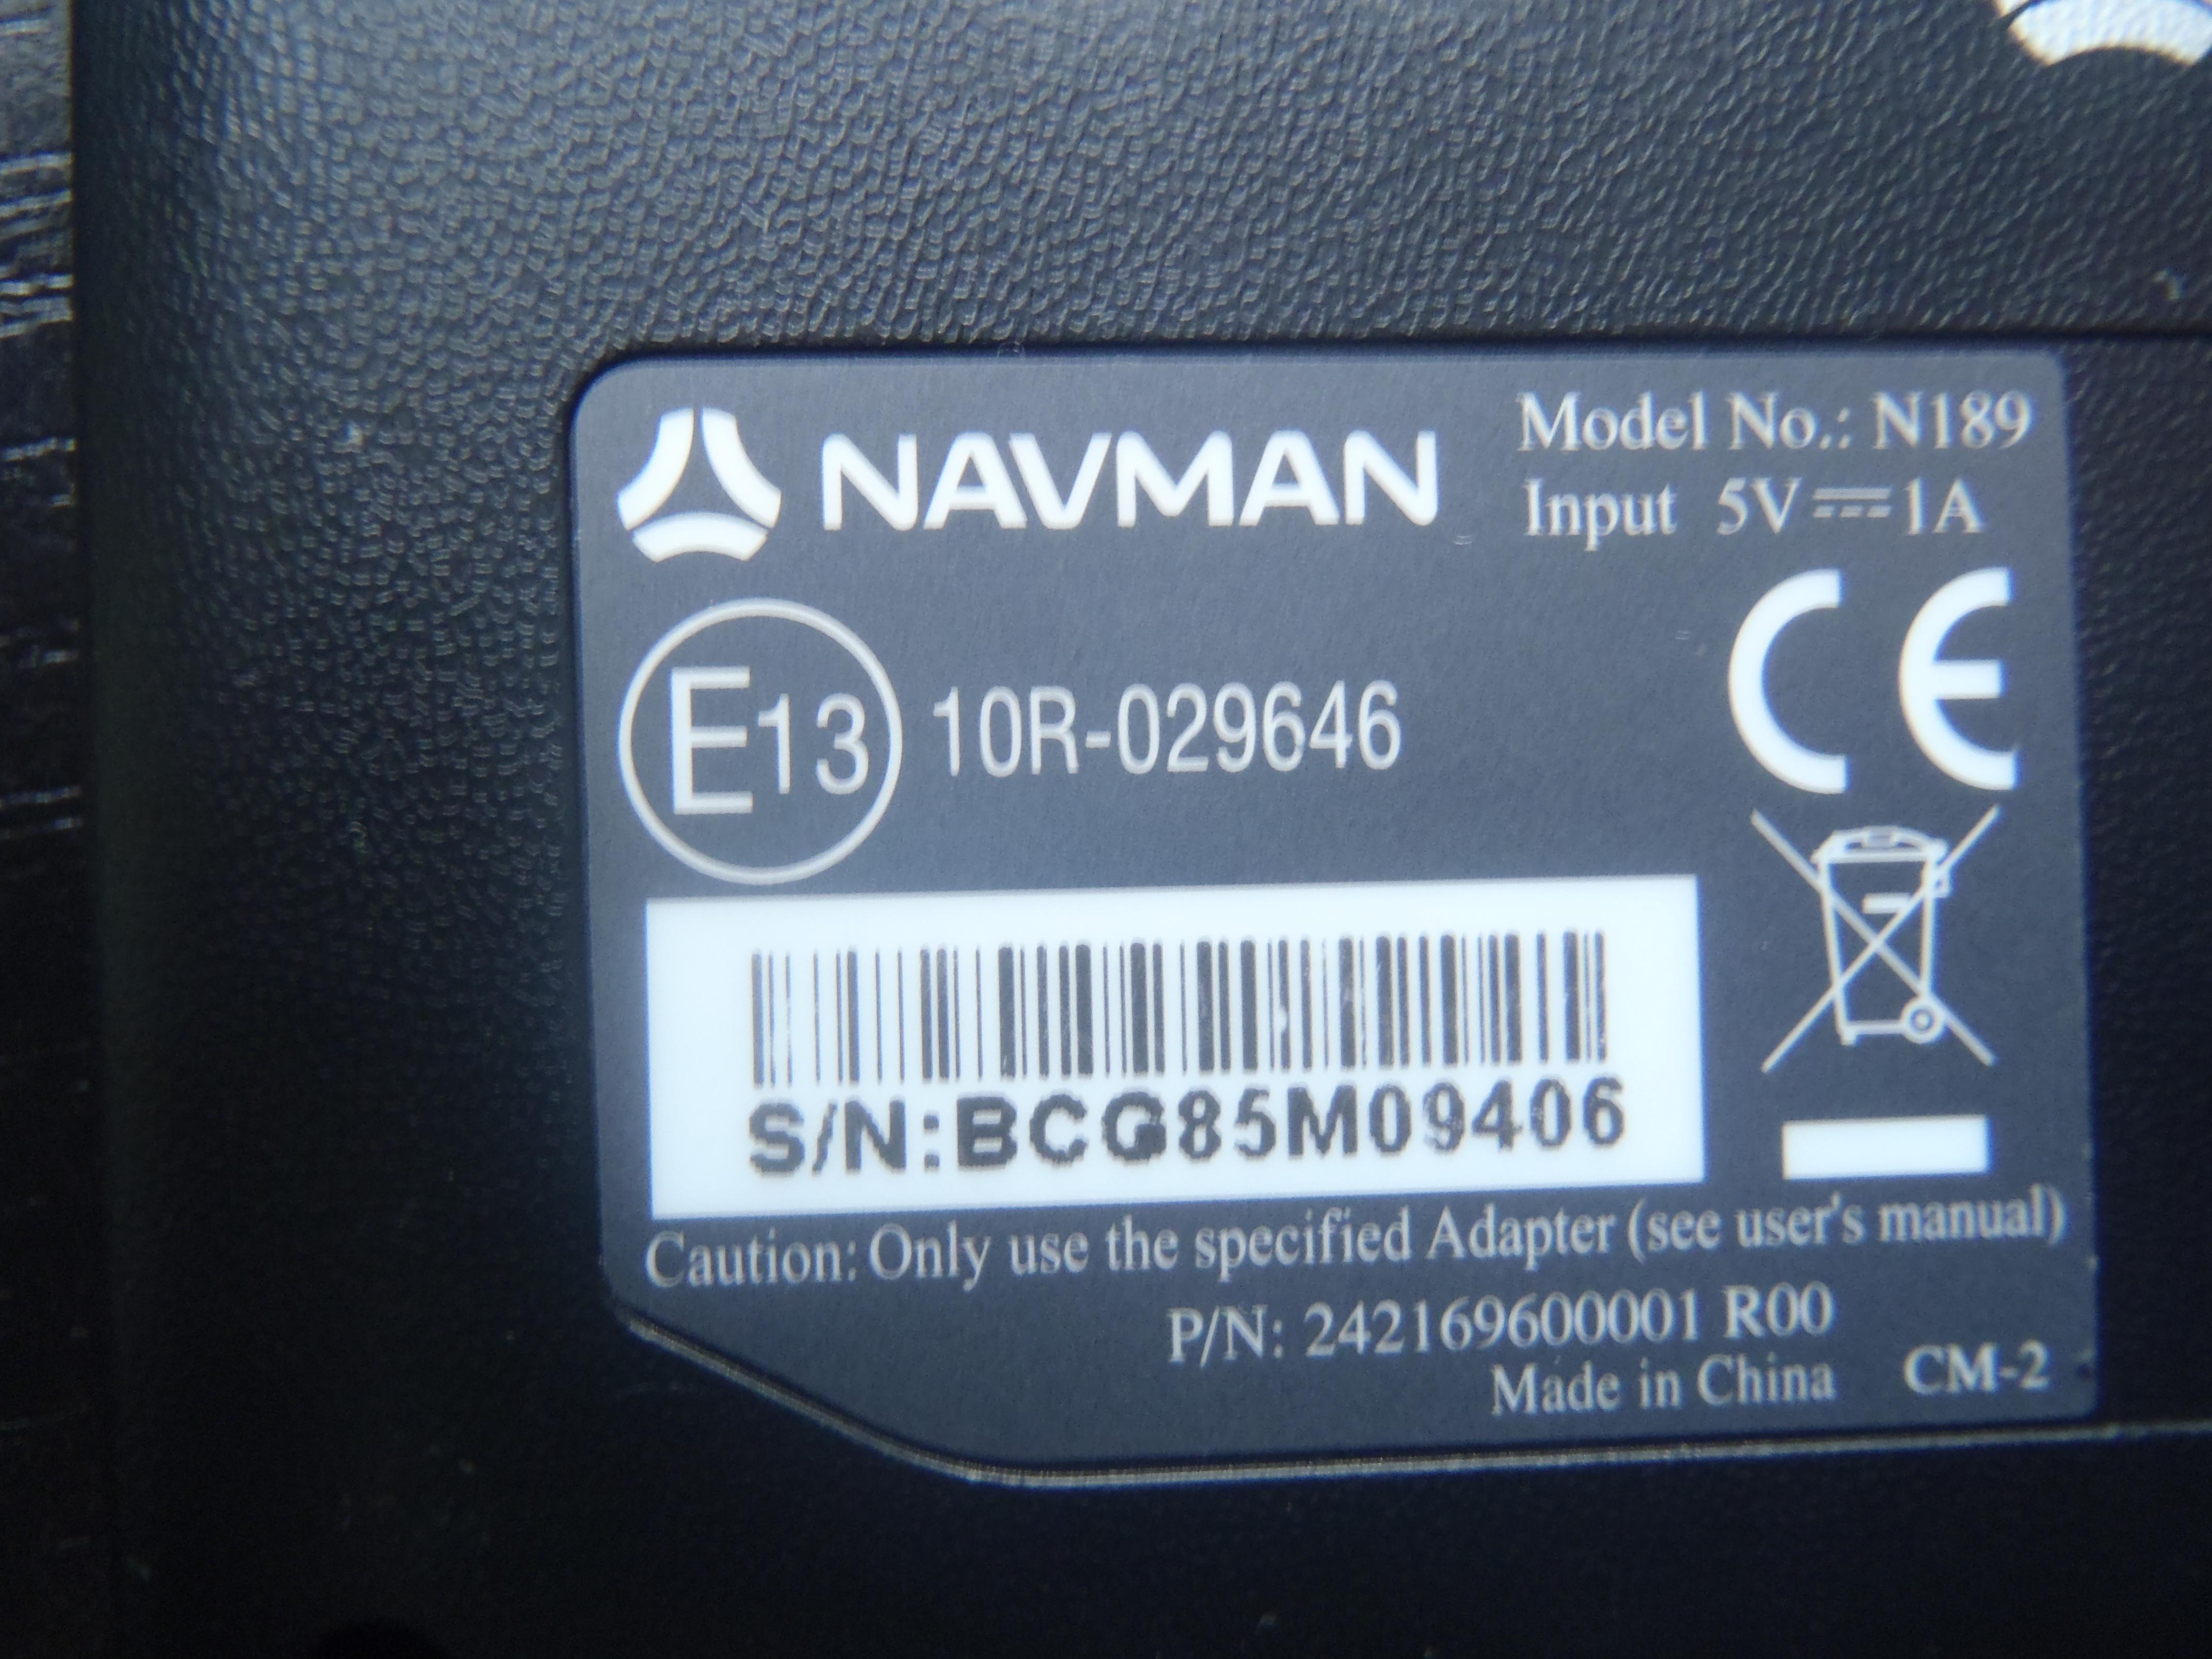 Nawigacja Navman model N189 F25 - elektroda pl